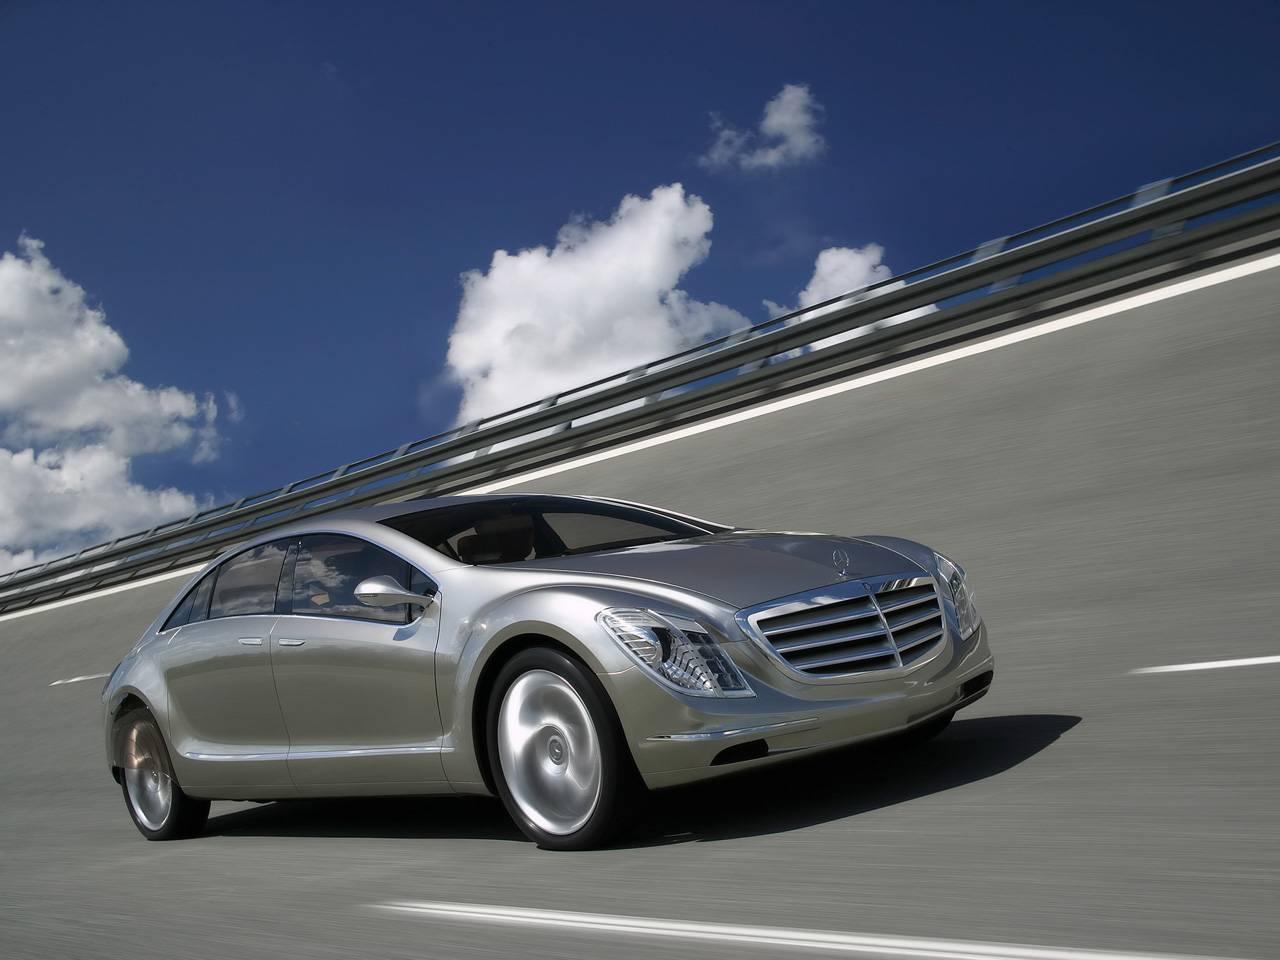 mersedes+arabalar+HEDZA+%252831%2529 Mercedes Modelleri